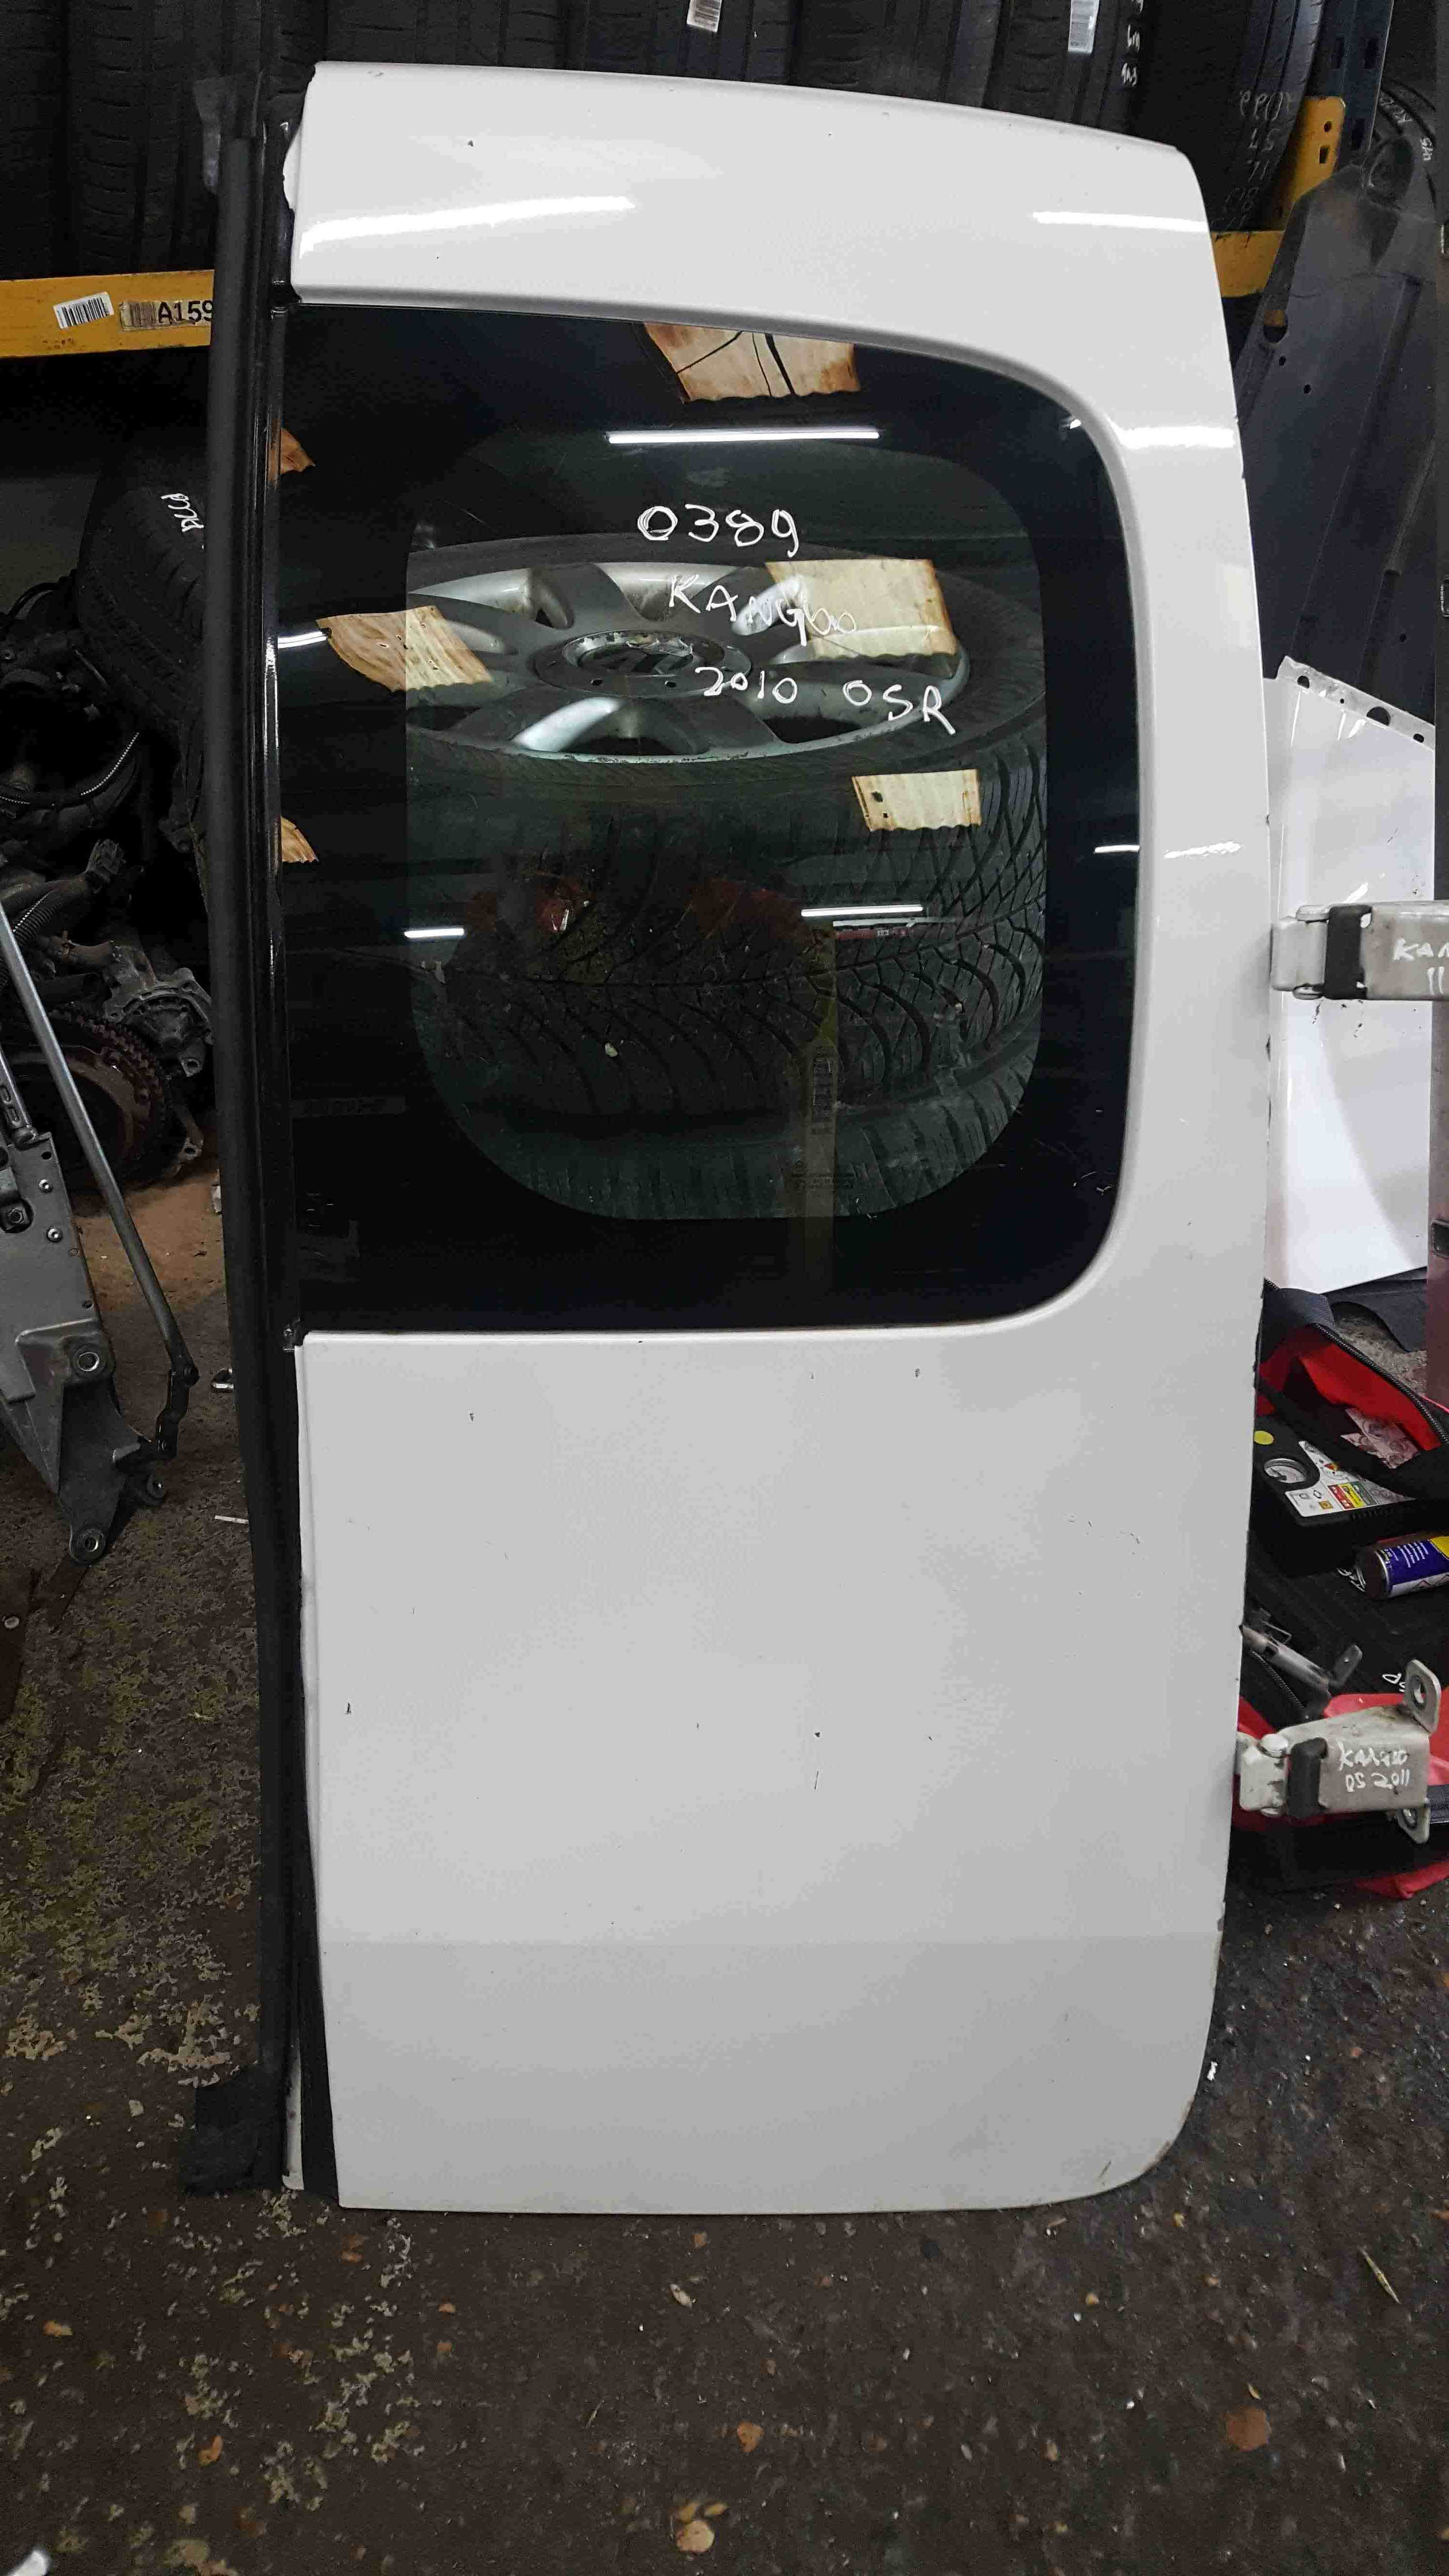 Renault Kangoo 2007-2017 Drivers OSR Rear Barn Door White O369